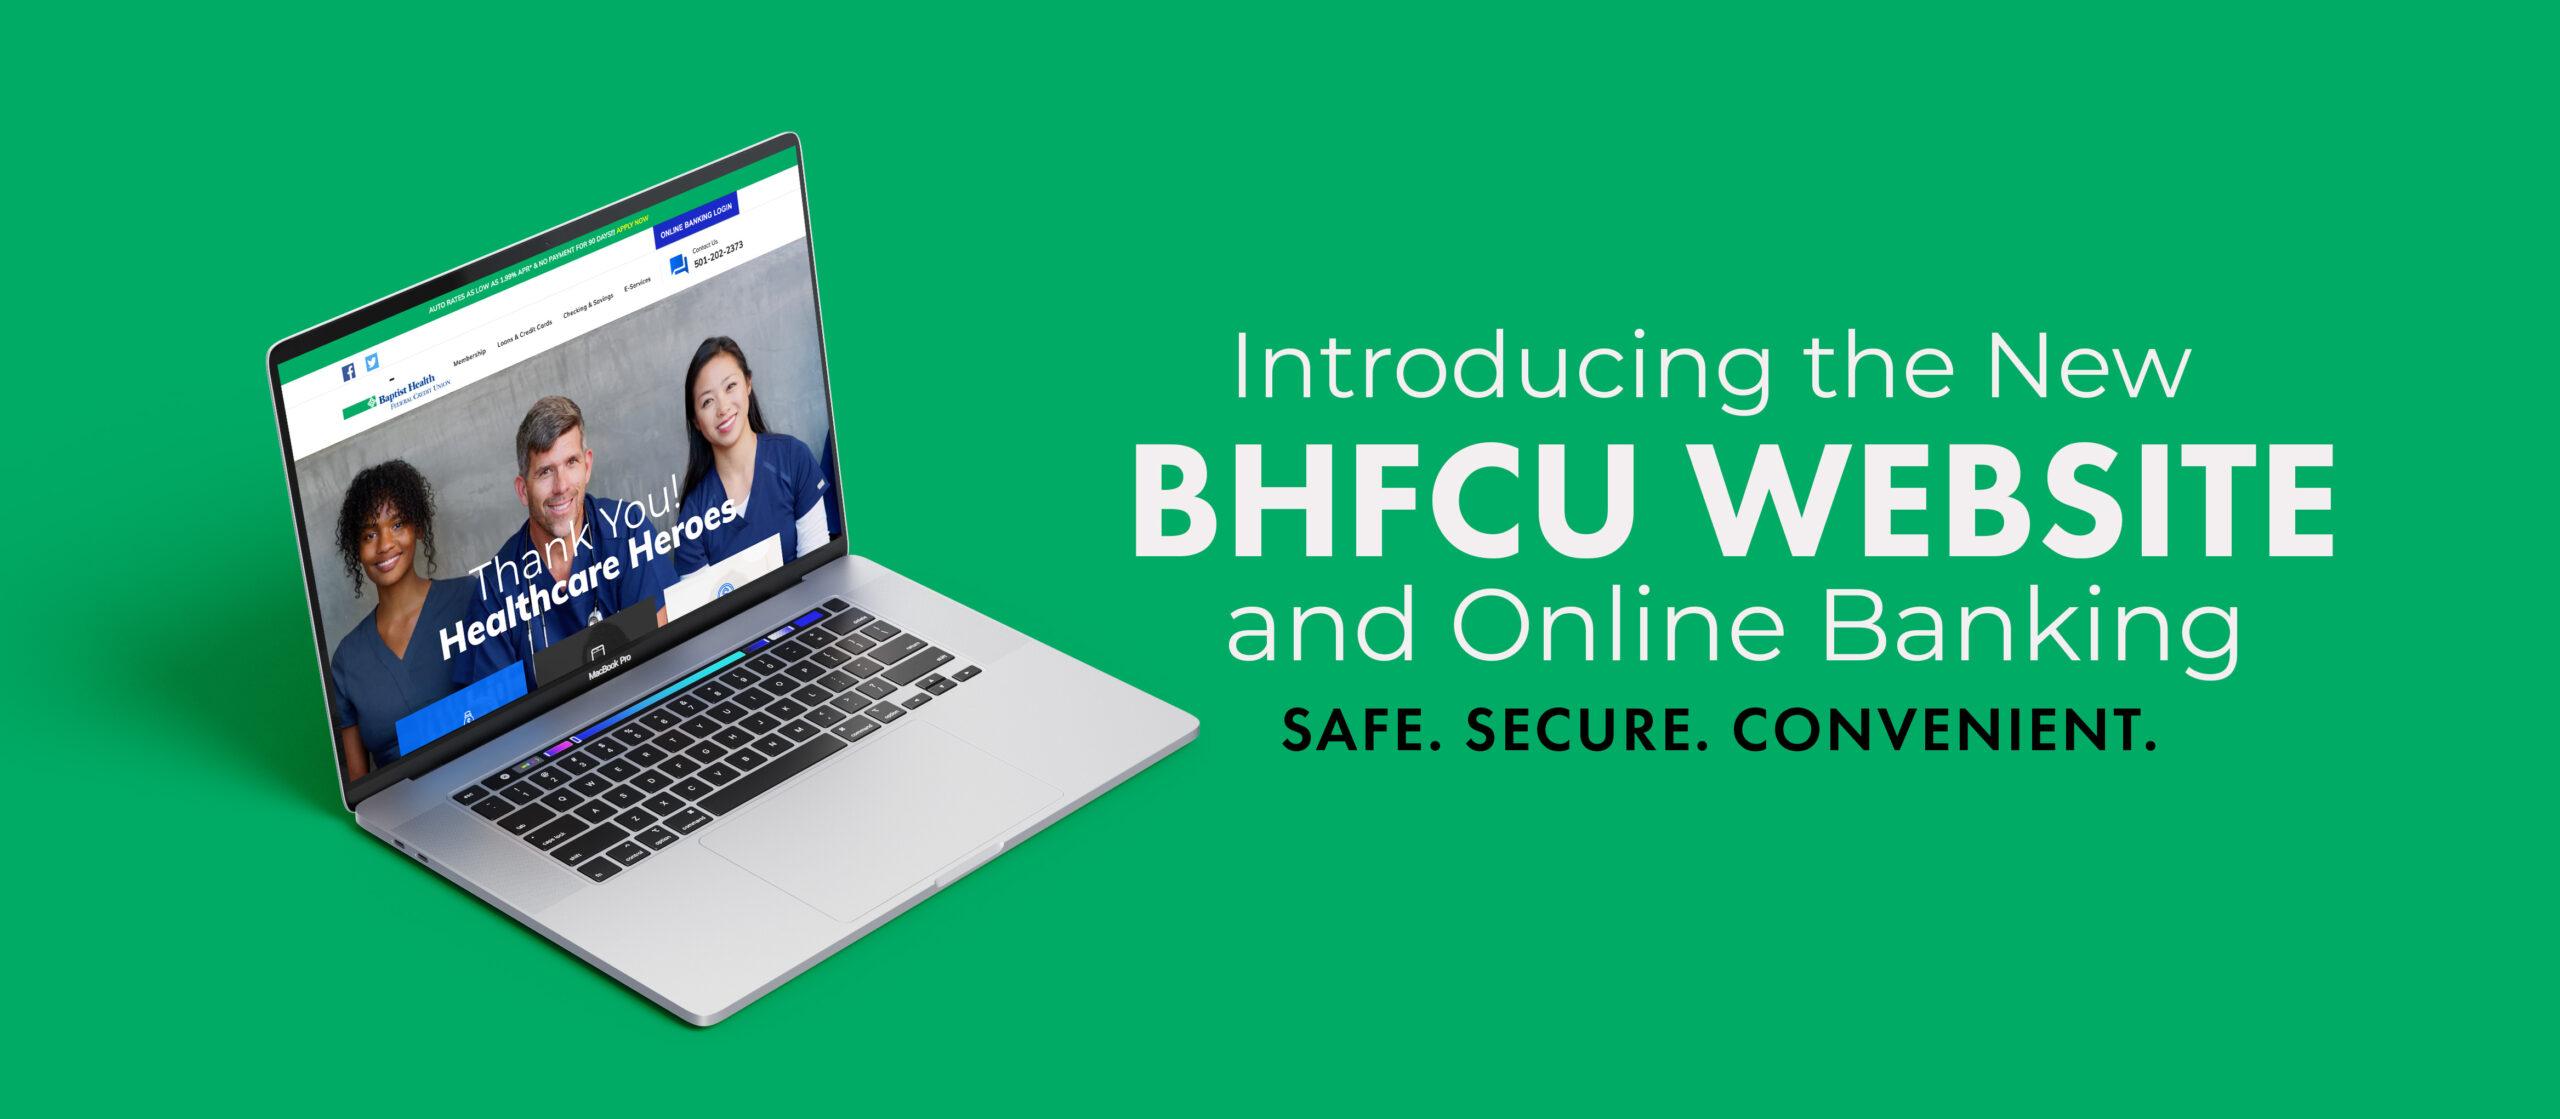 BHFCU Computer Mockup